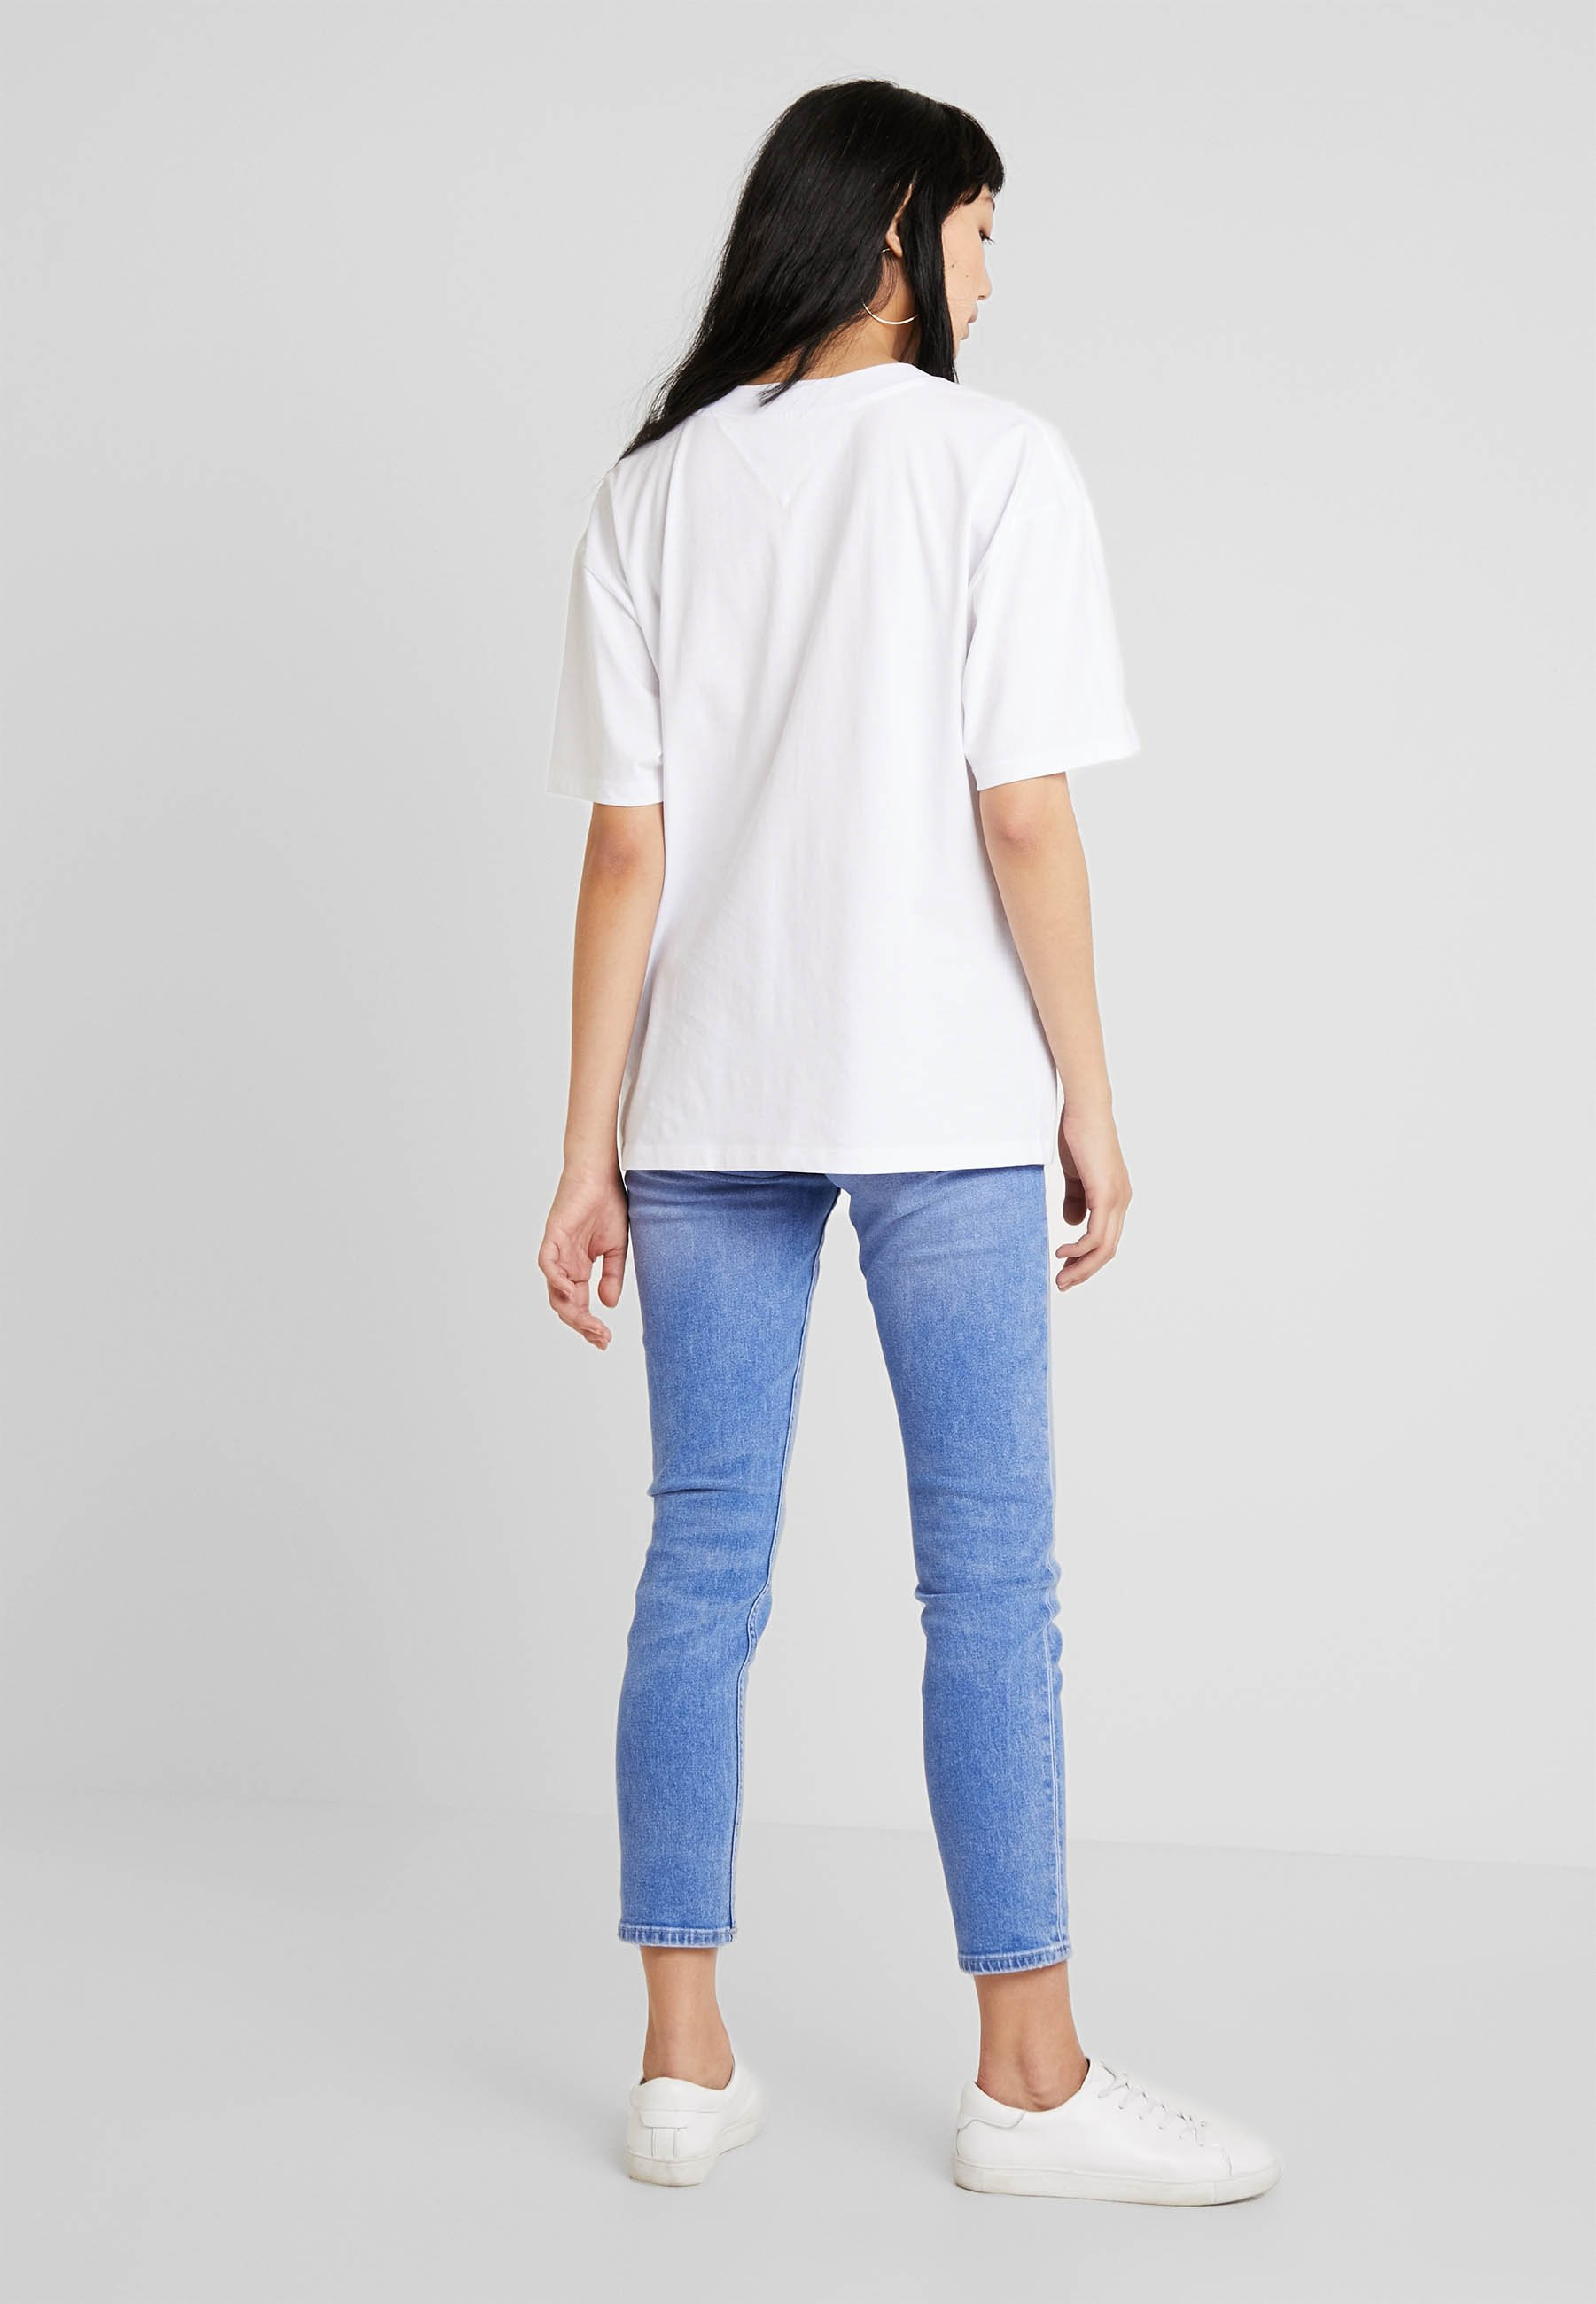 Box White TeeT Classic Logo shirt Imprimé Tommy Jeans 5Aj43RL